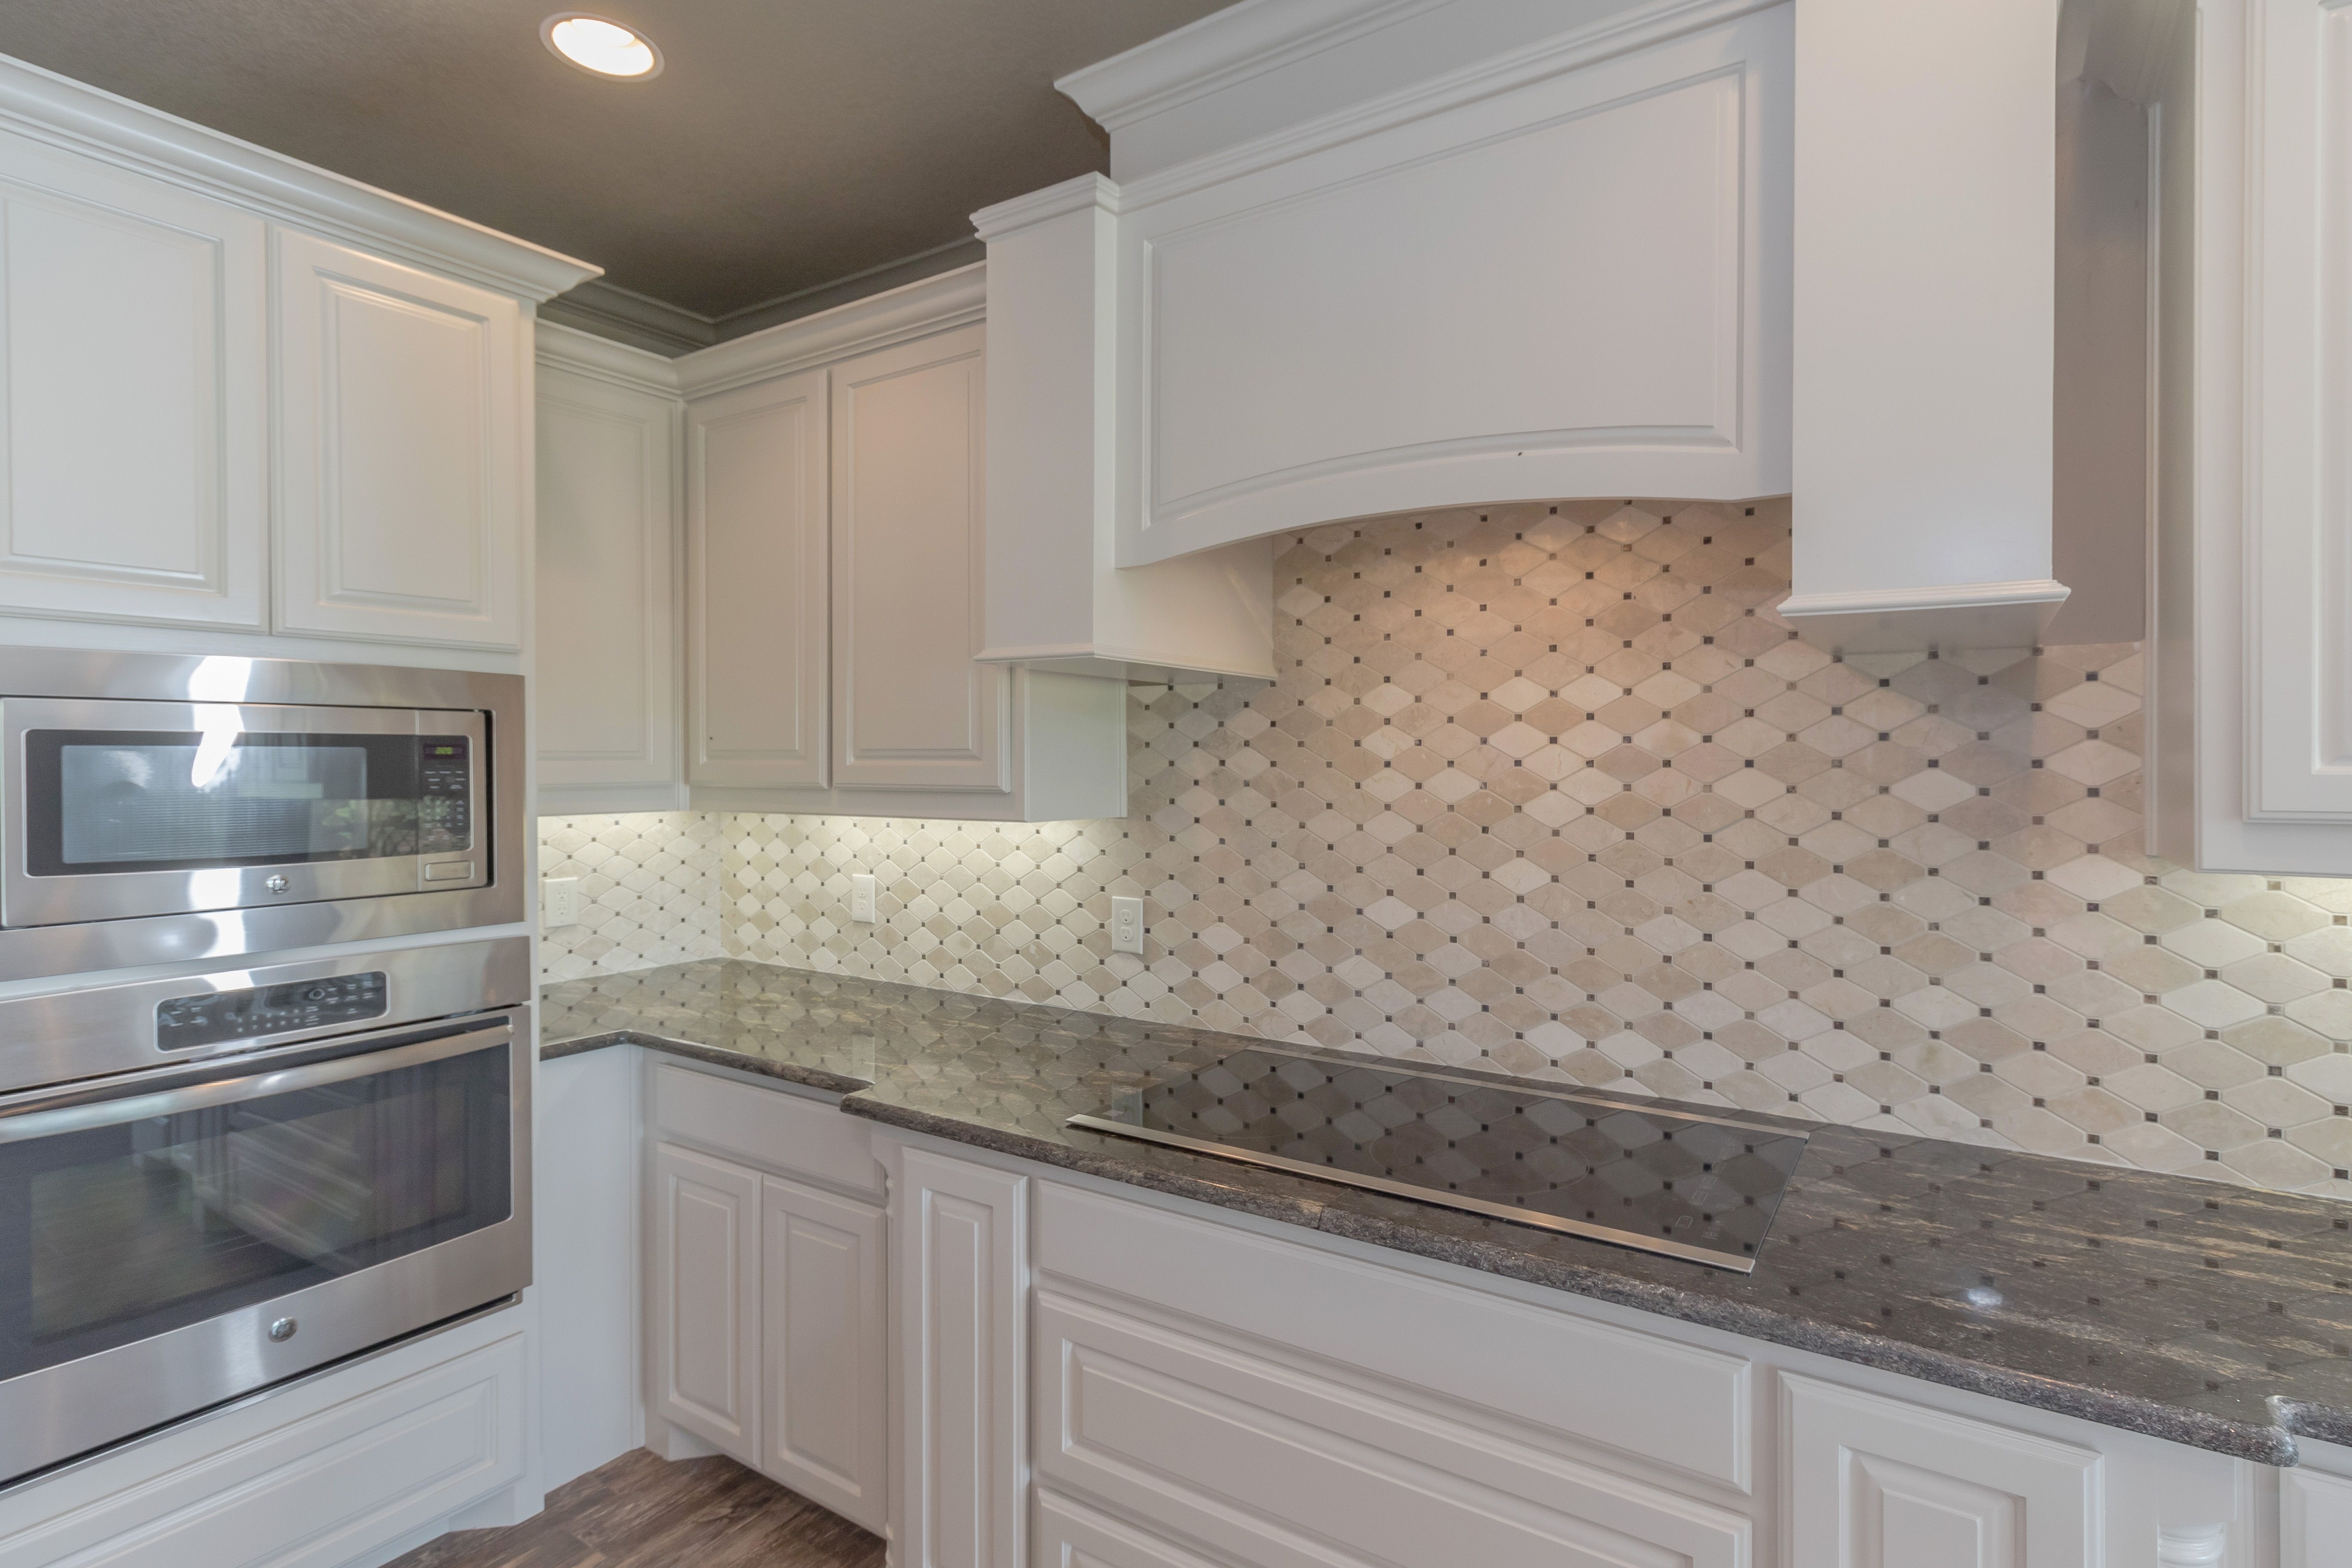 Intricate Kitchen Back Splash Design By Doug Parr Custom Homes Elegant Kitchens Kitchen Backsplash Custom Homes